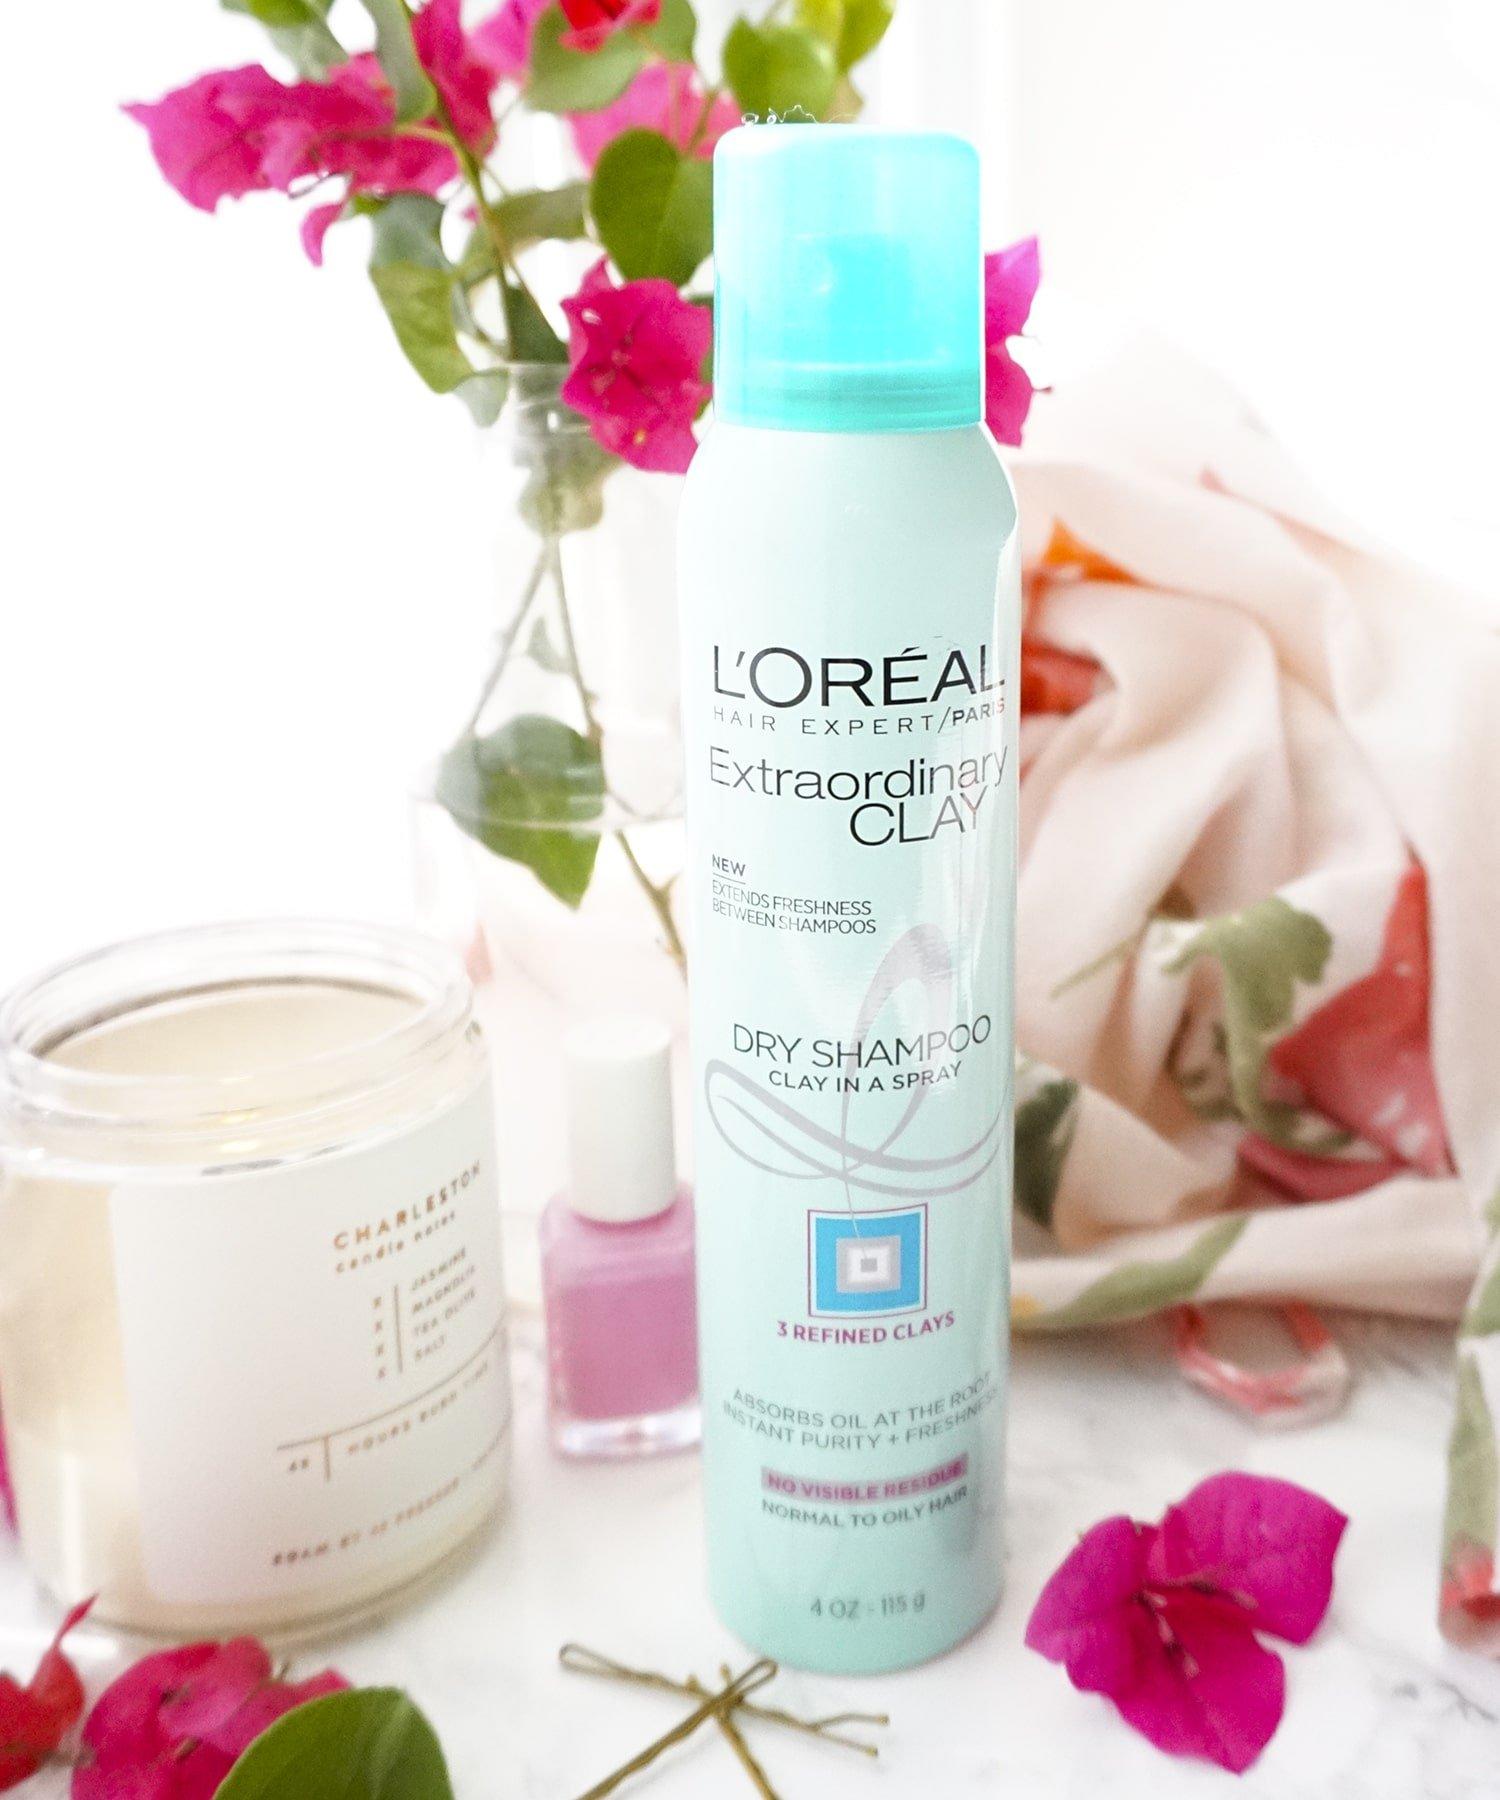 Blogger Ashley Brooke's Review of L'Oreal's Extraordinary Clay Dry Shampoo